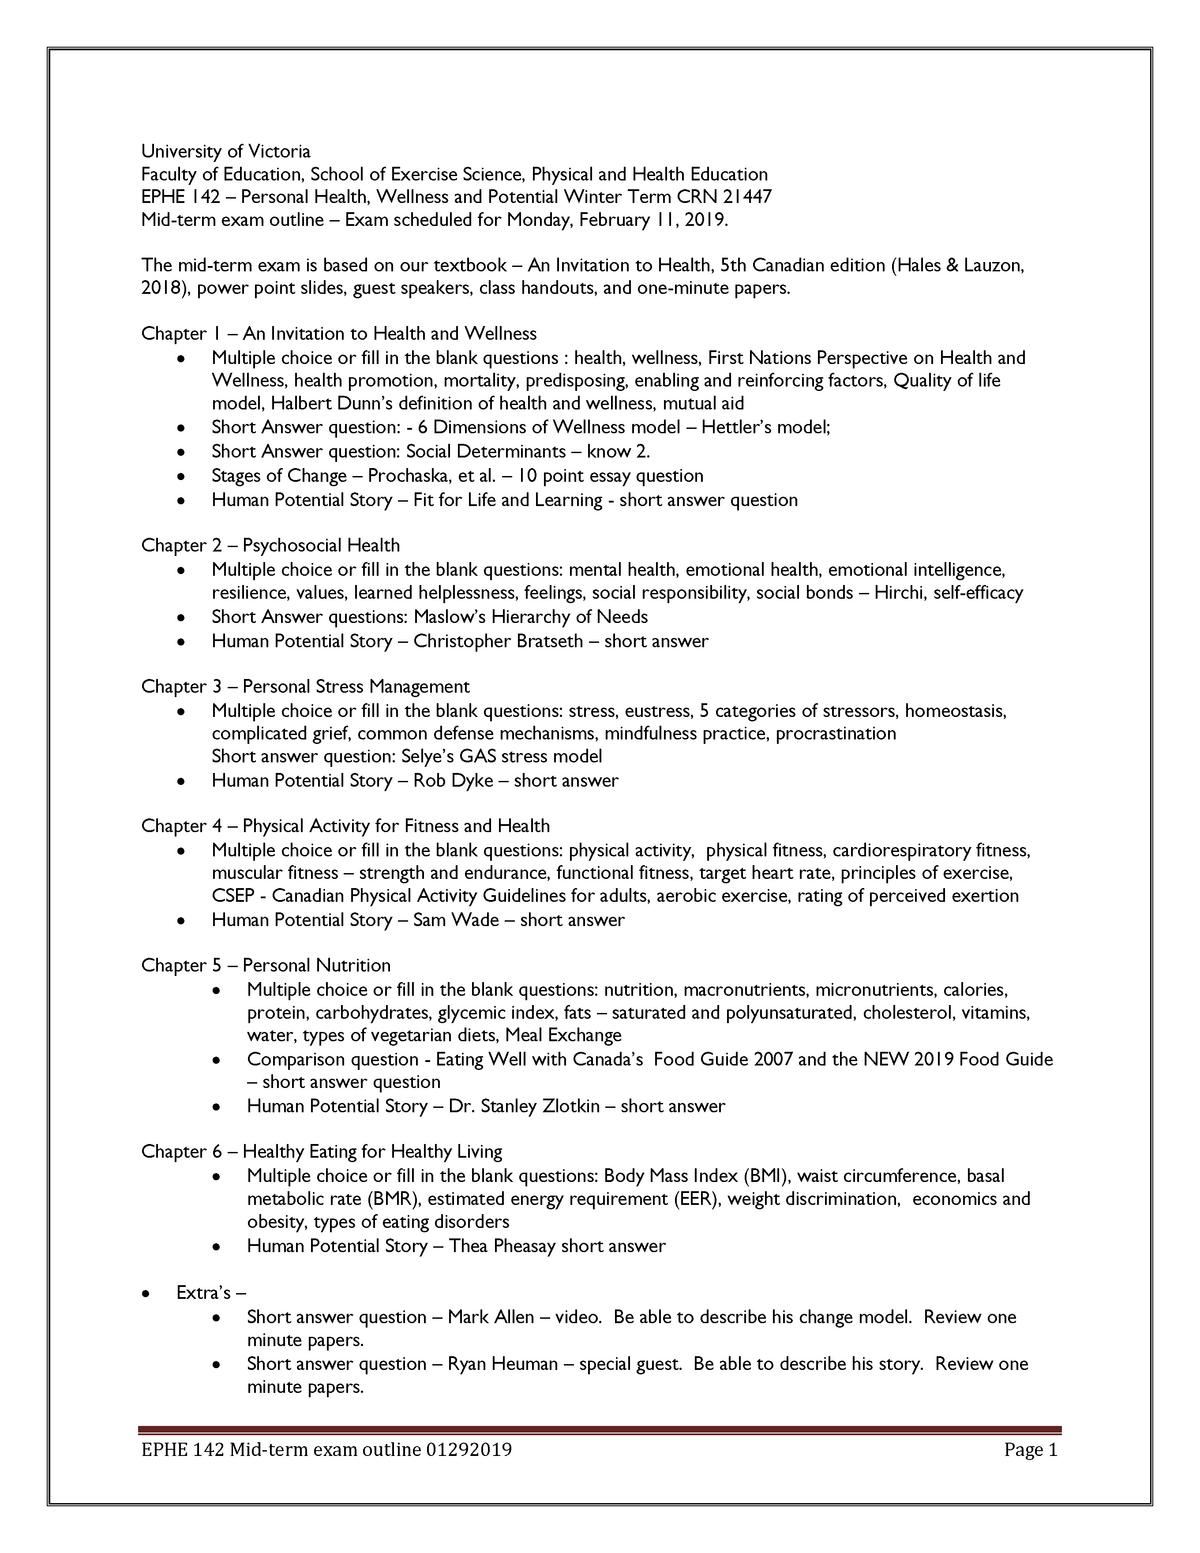 Exam 2019 - Ephe142: Personal Health Wellness and Potential - StuDocu